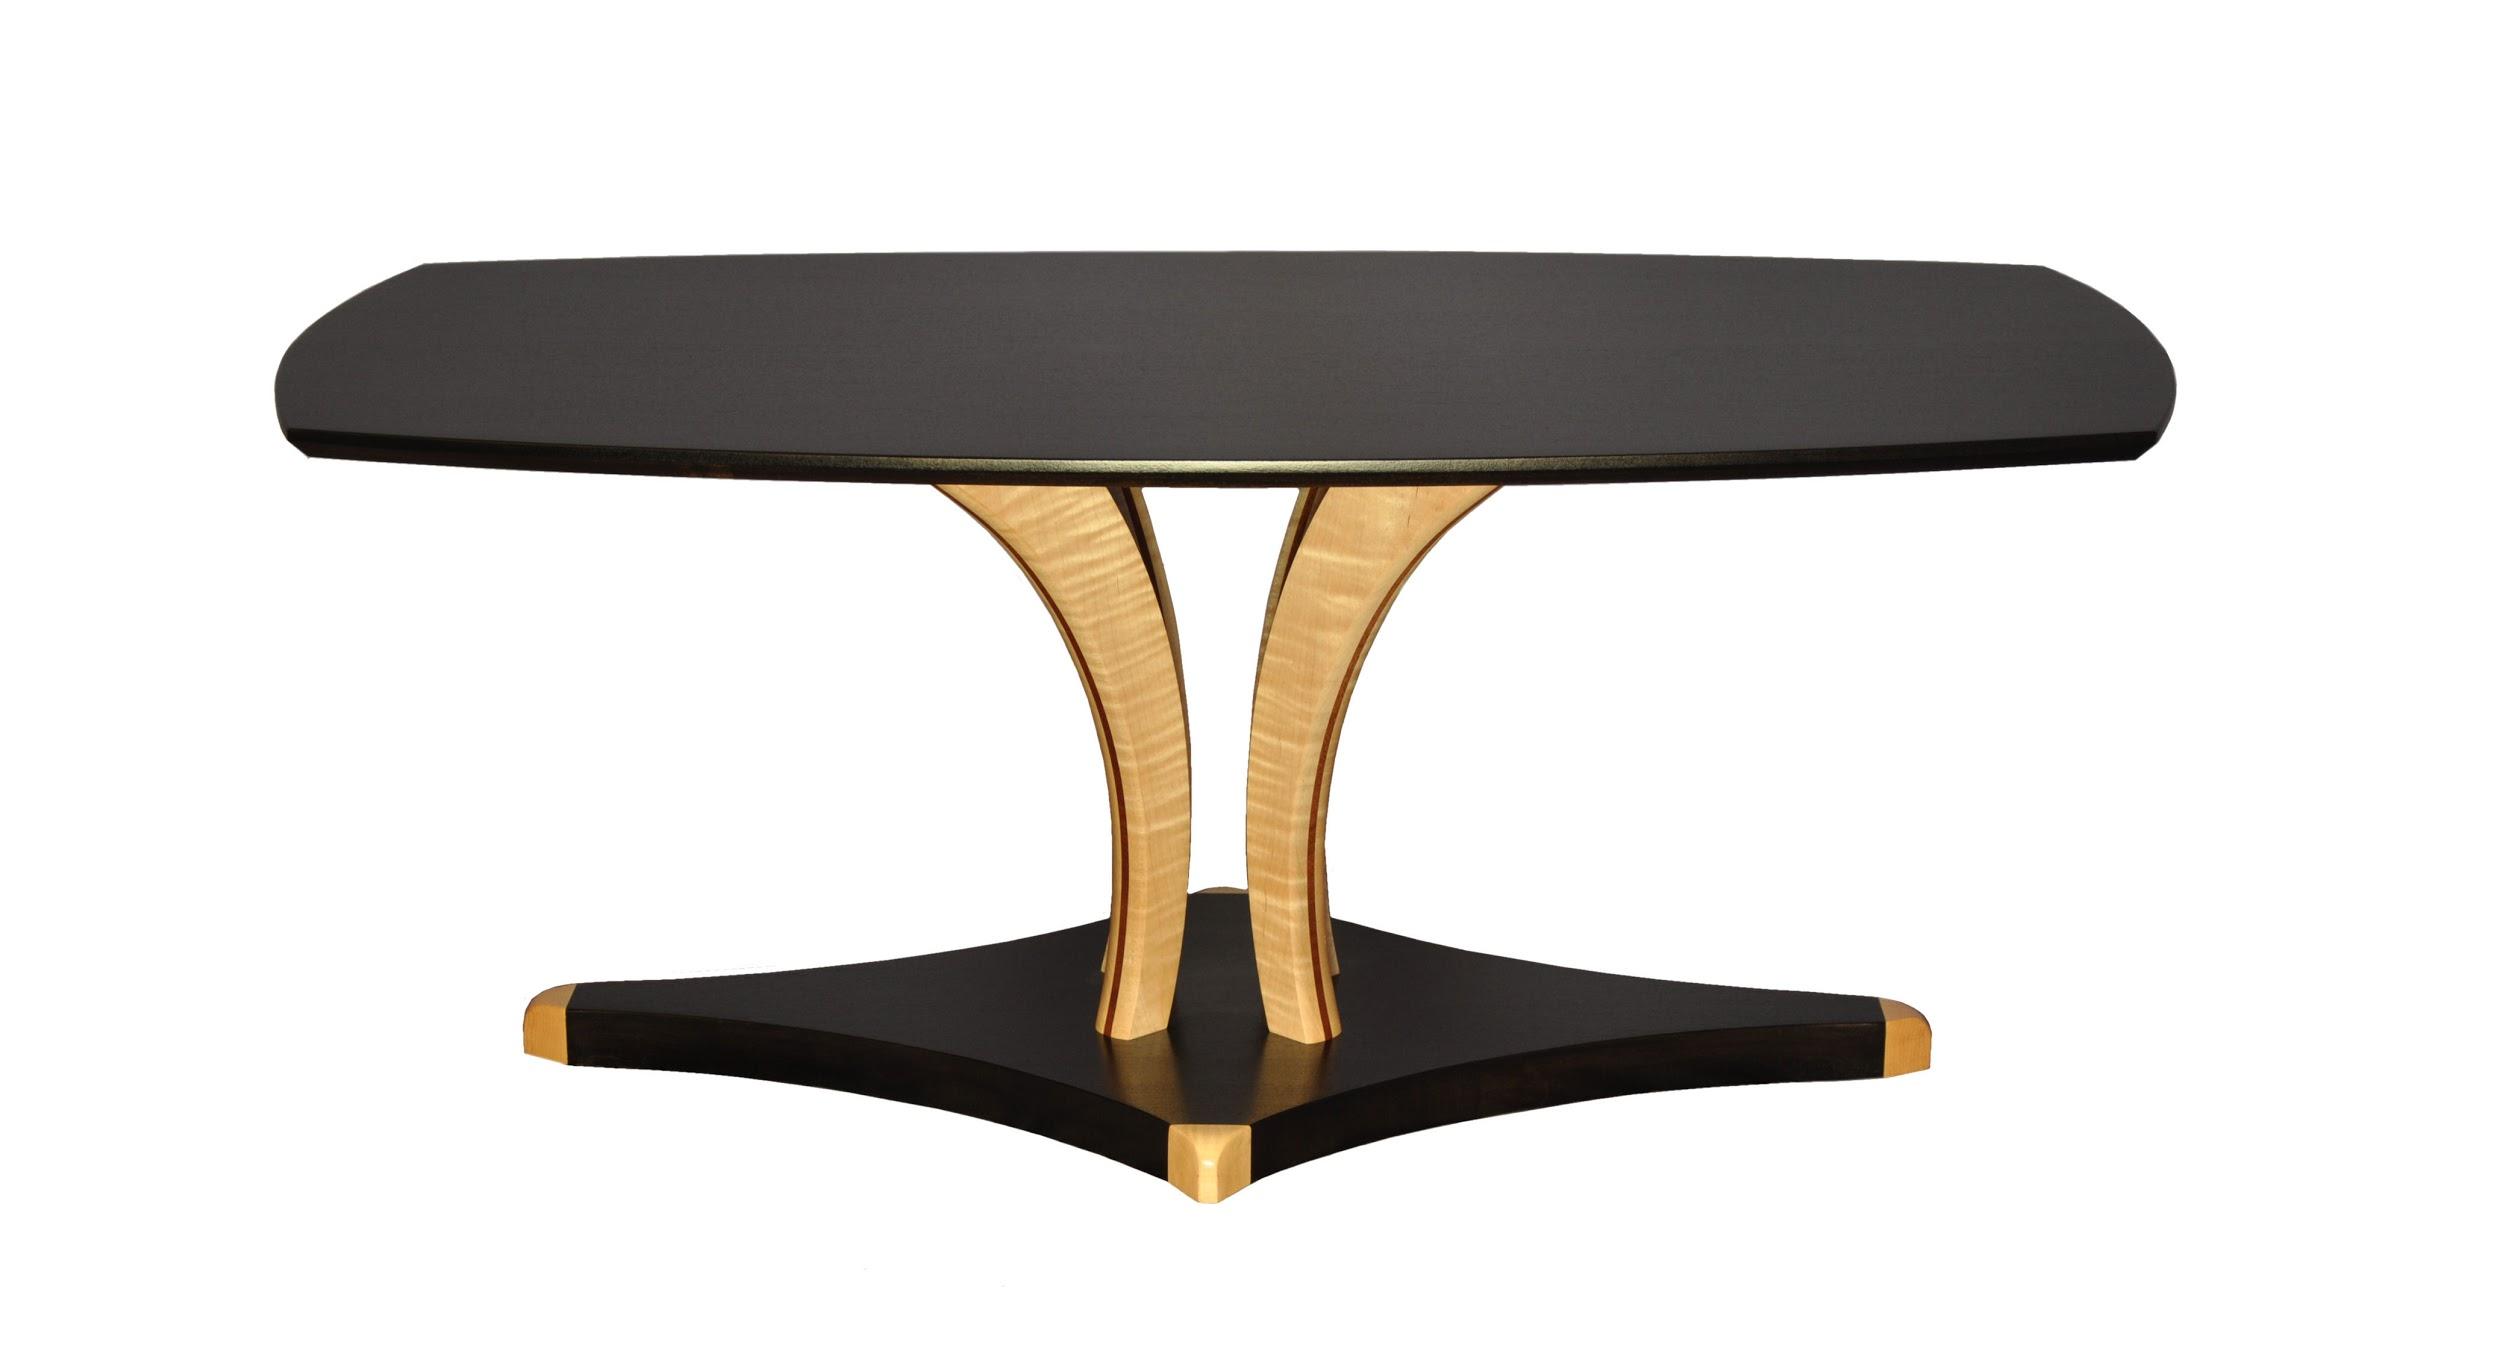 Contemporary Art Sofa Table